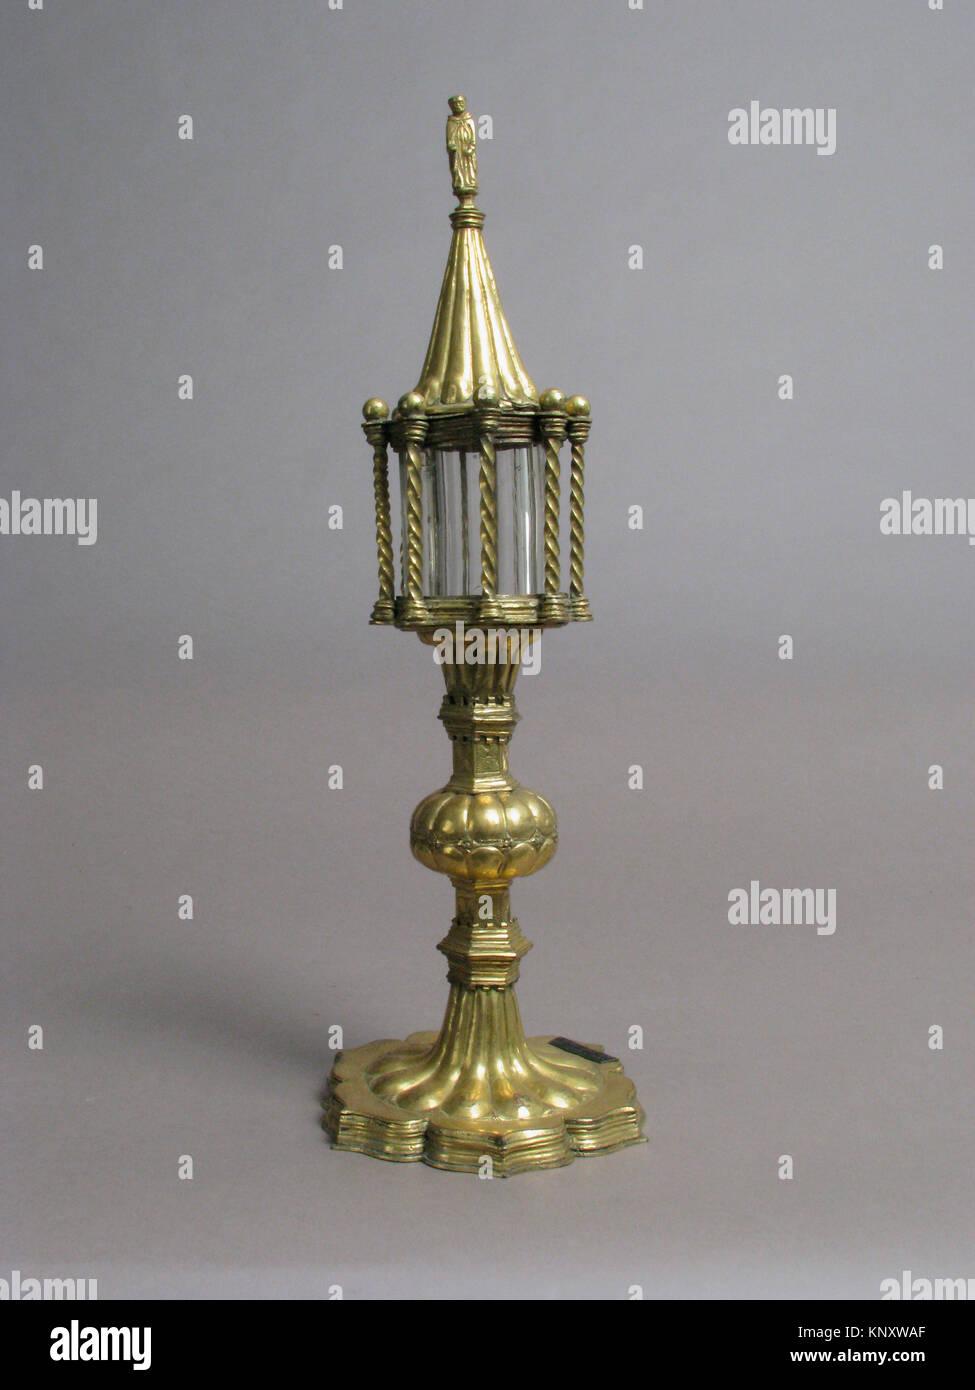 Reliquary. Date: 16th century; Culture: Italian; Medium: Copper-gilt, rock crystal, silver and niello plaque; Dimensions: - Stock Image